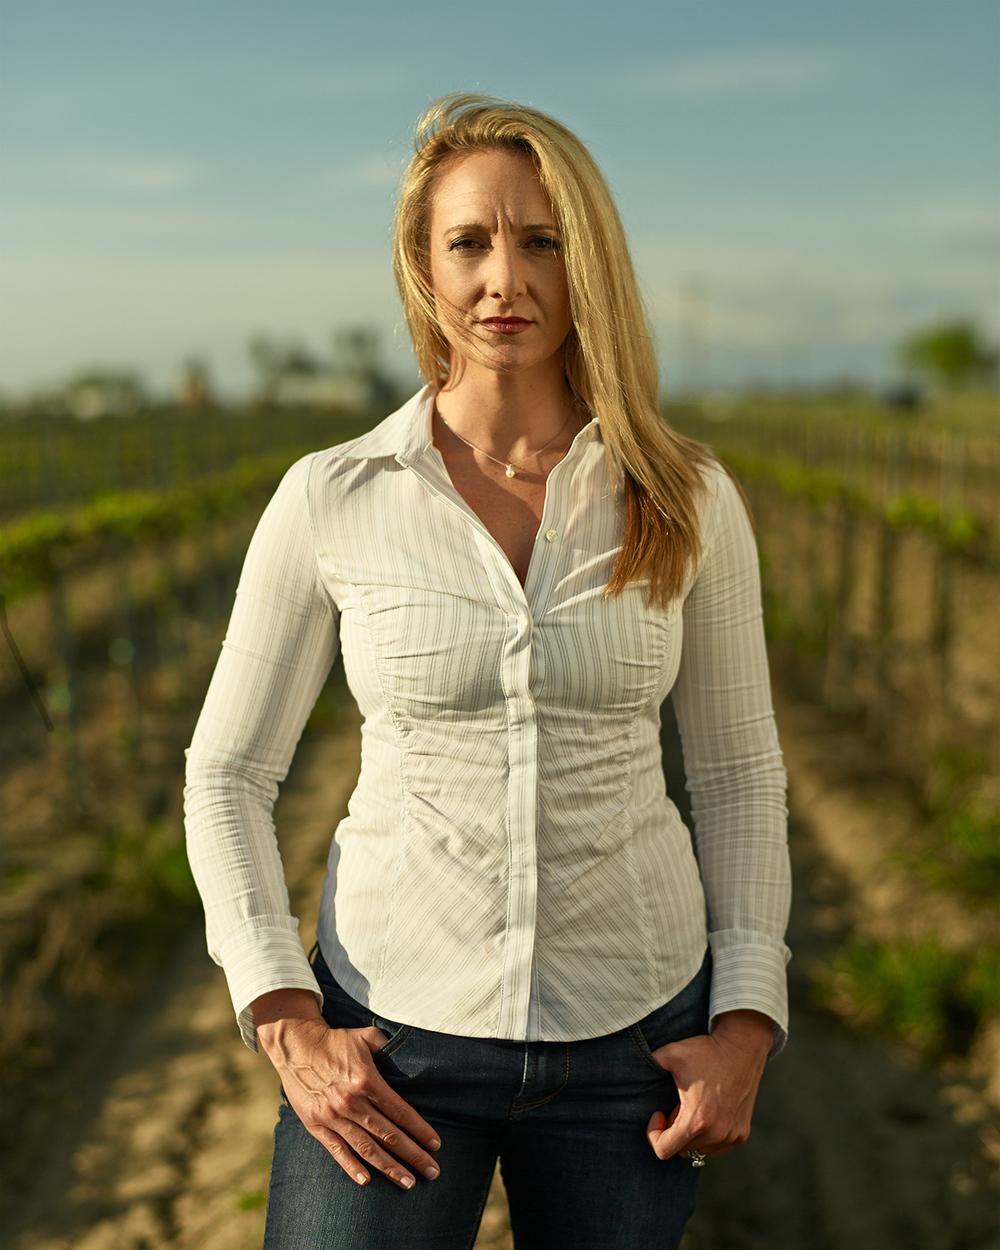 Anja Raudabaugh for California Lawyer Magazine